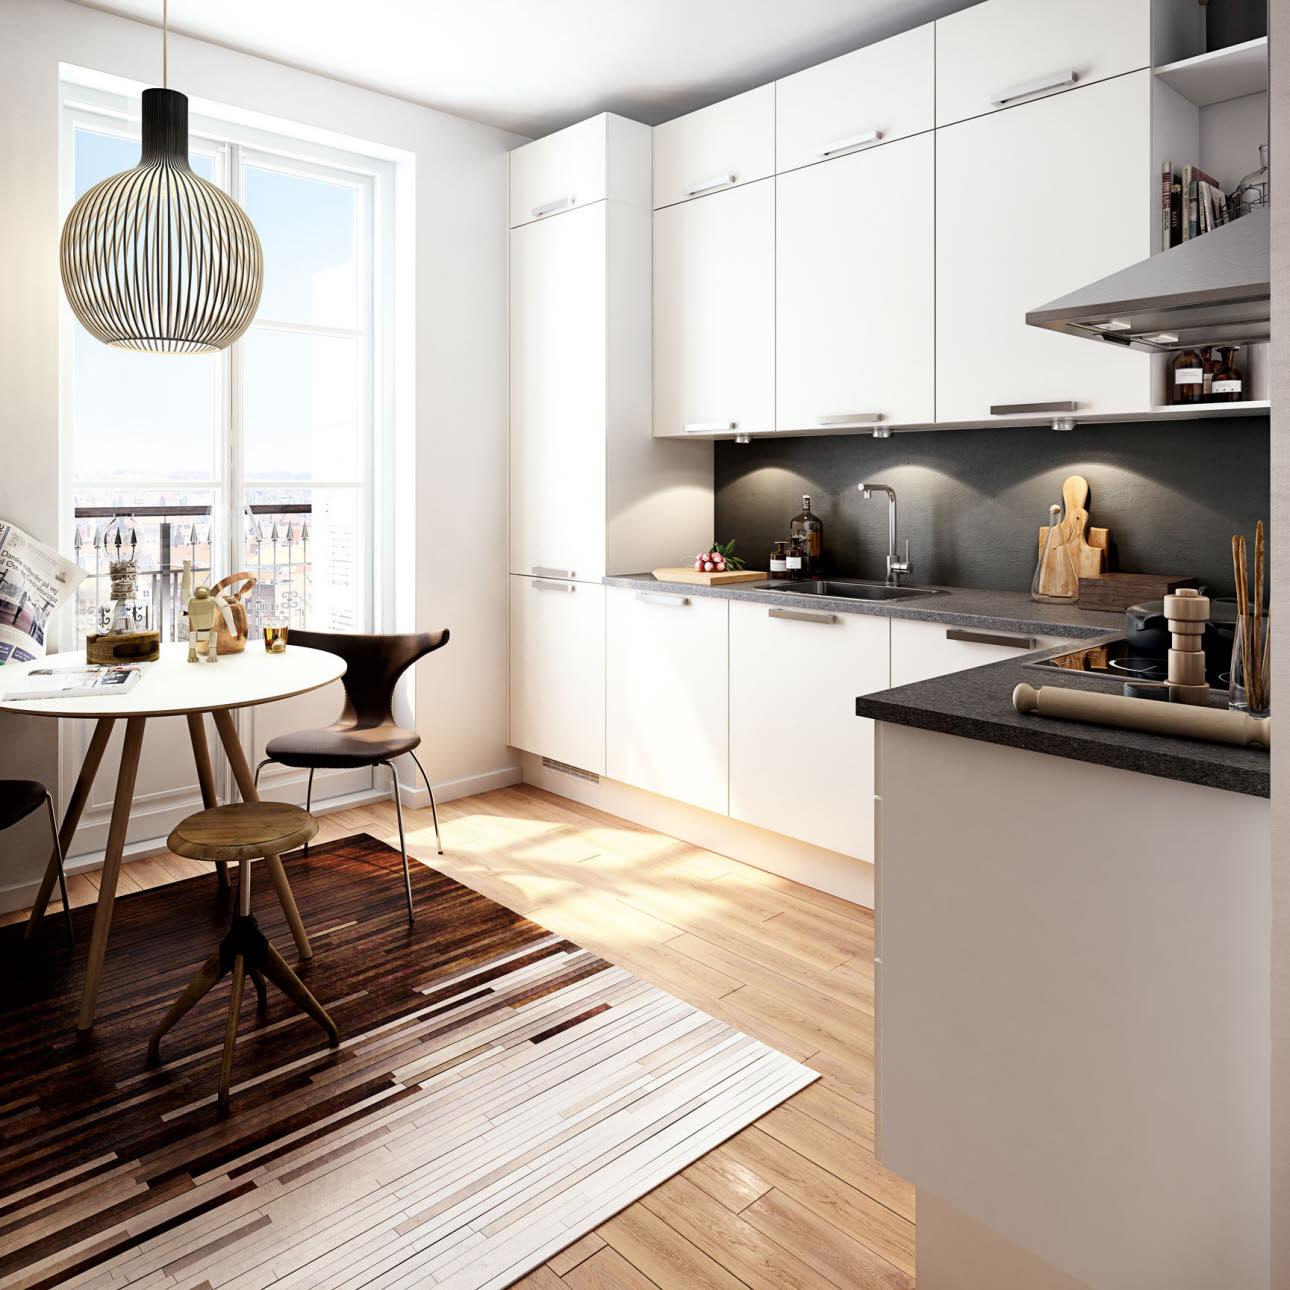 Kitchen design for modern life: Find your new kitchen | HTH